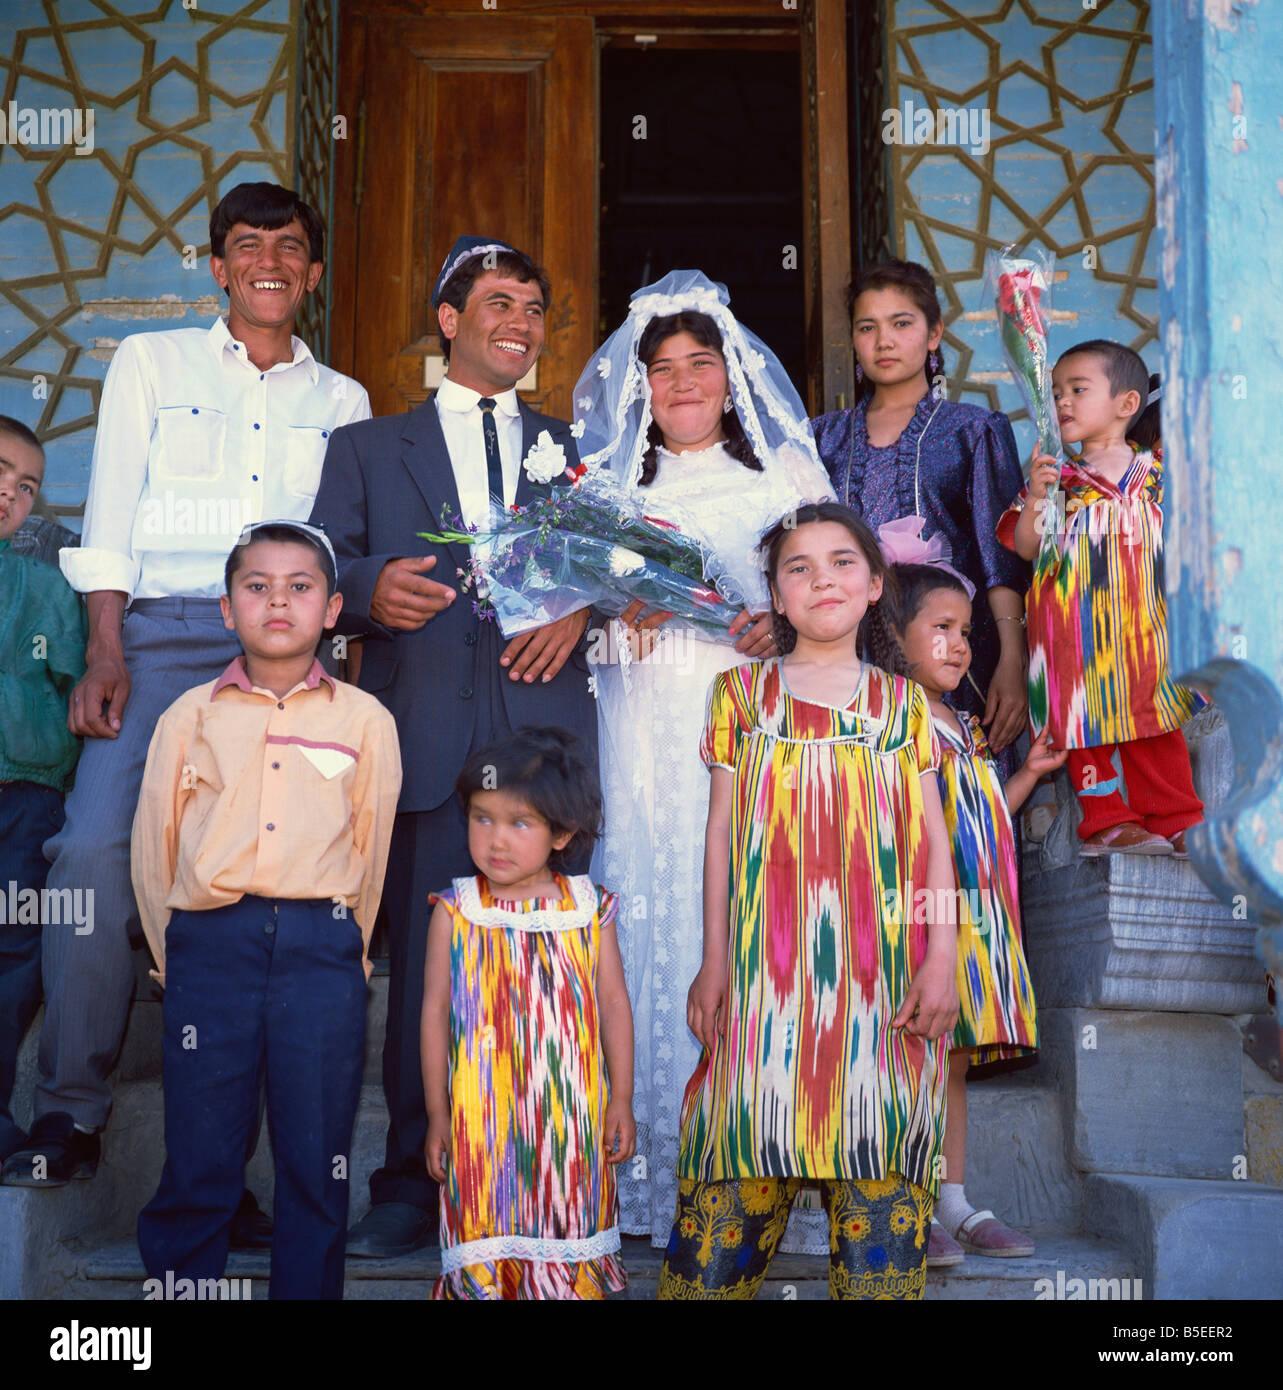 Uzbek wedding in tashkent